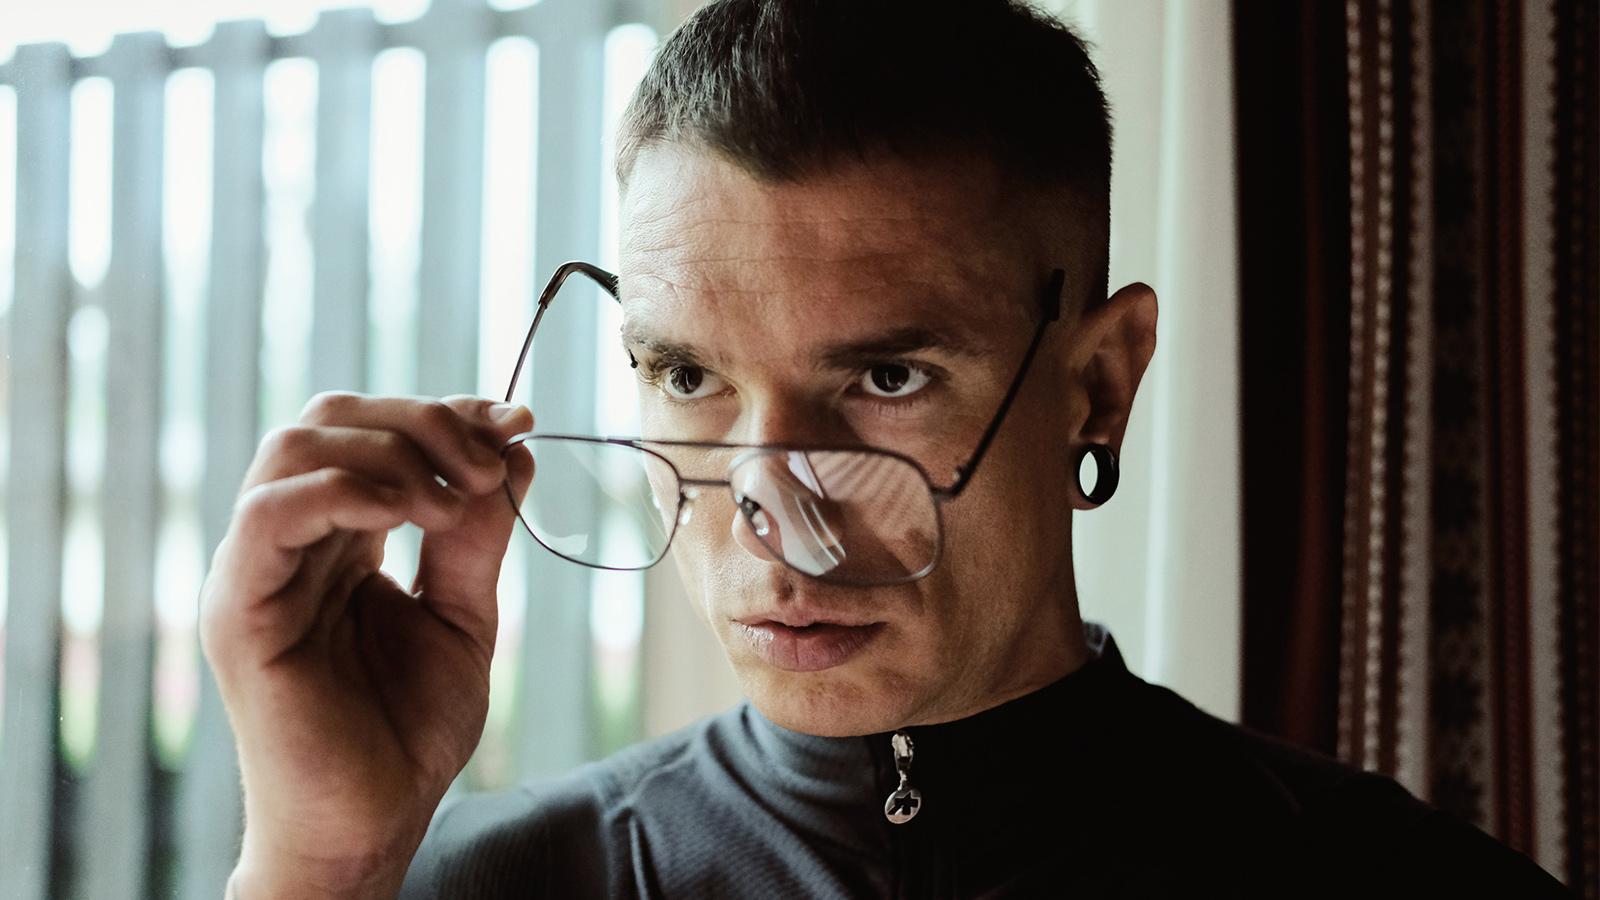 Alba Optics Ferro